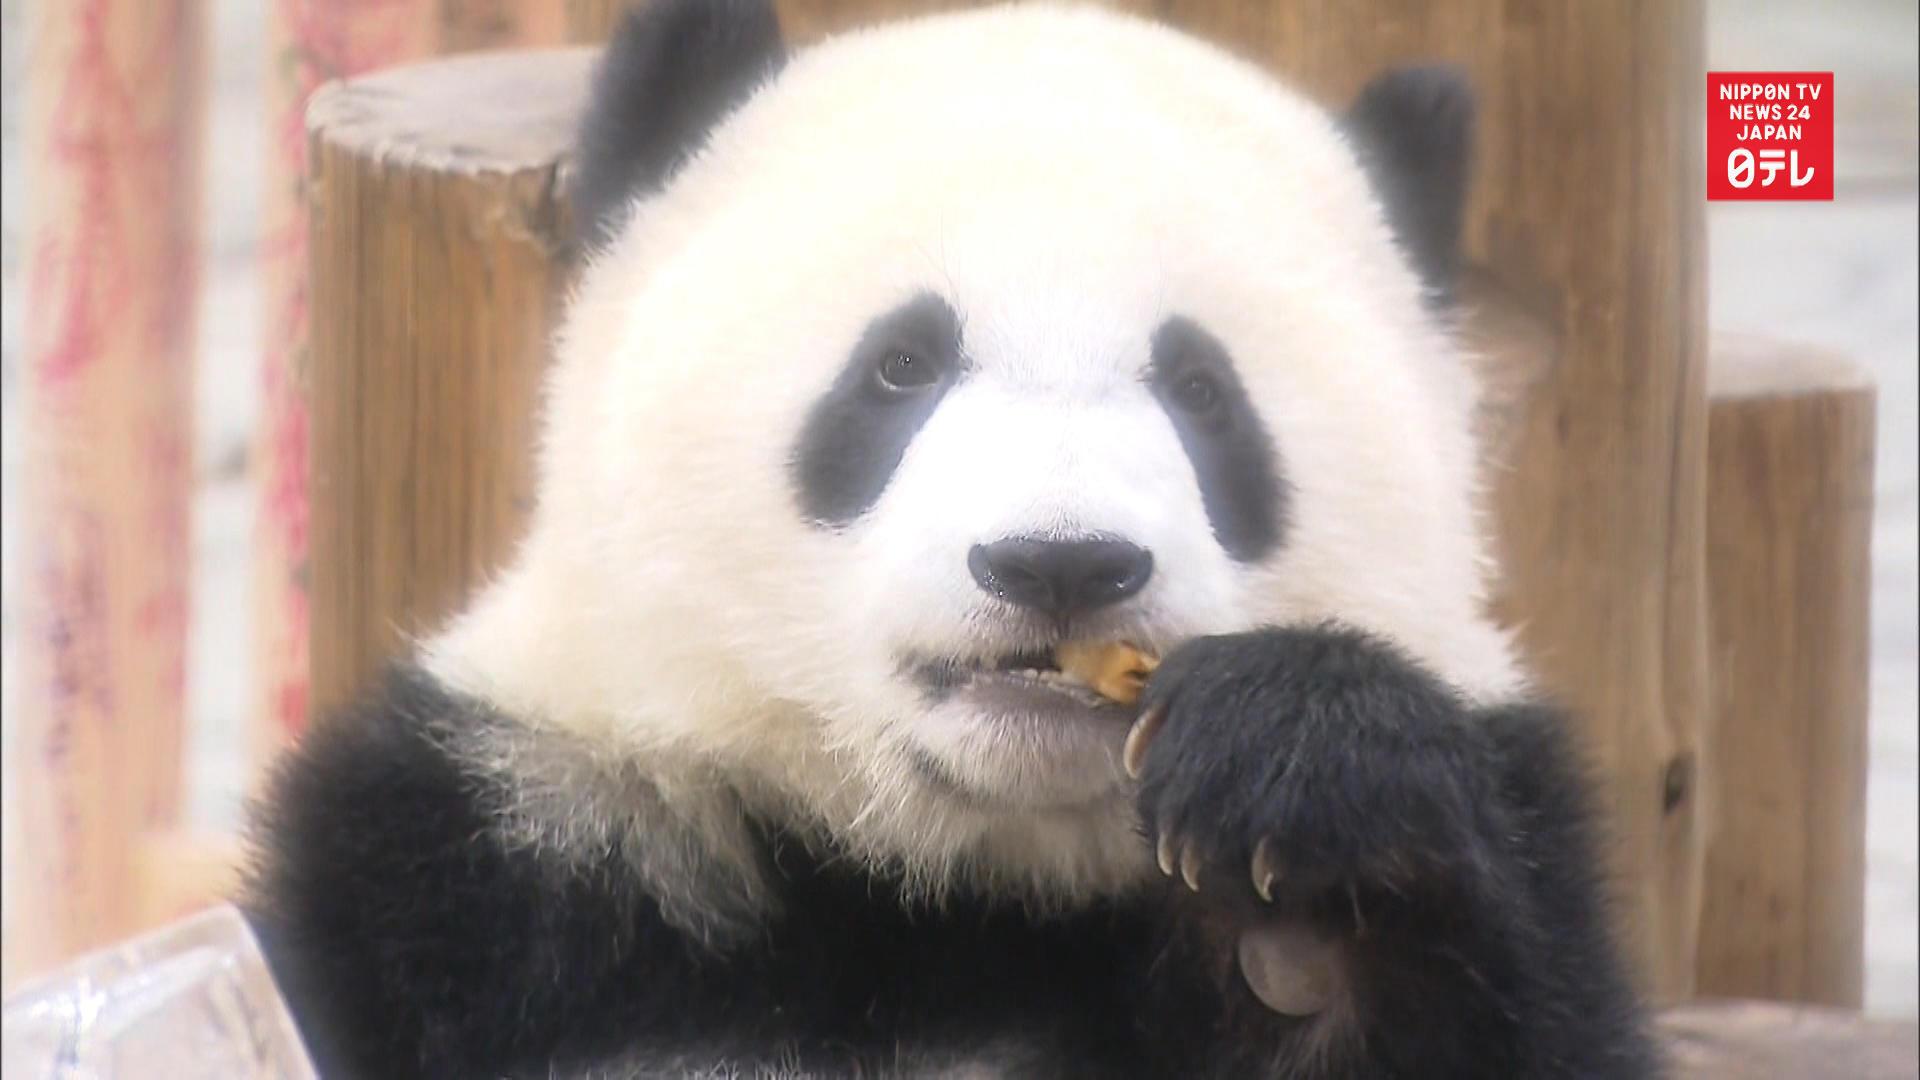 Giant panda Saihin turns 1